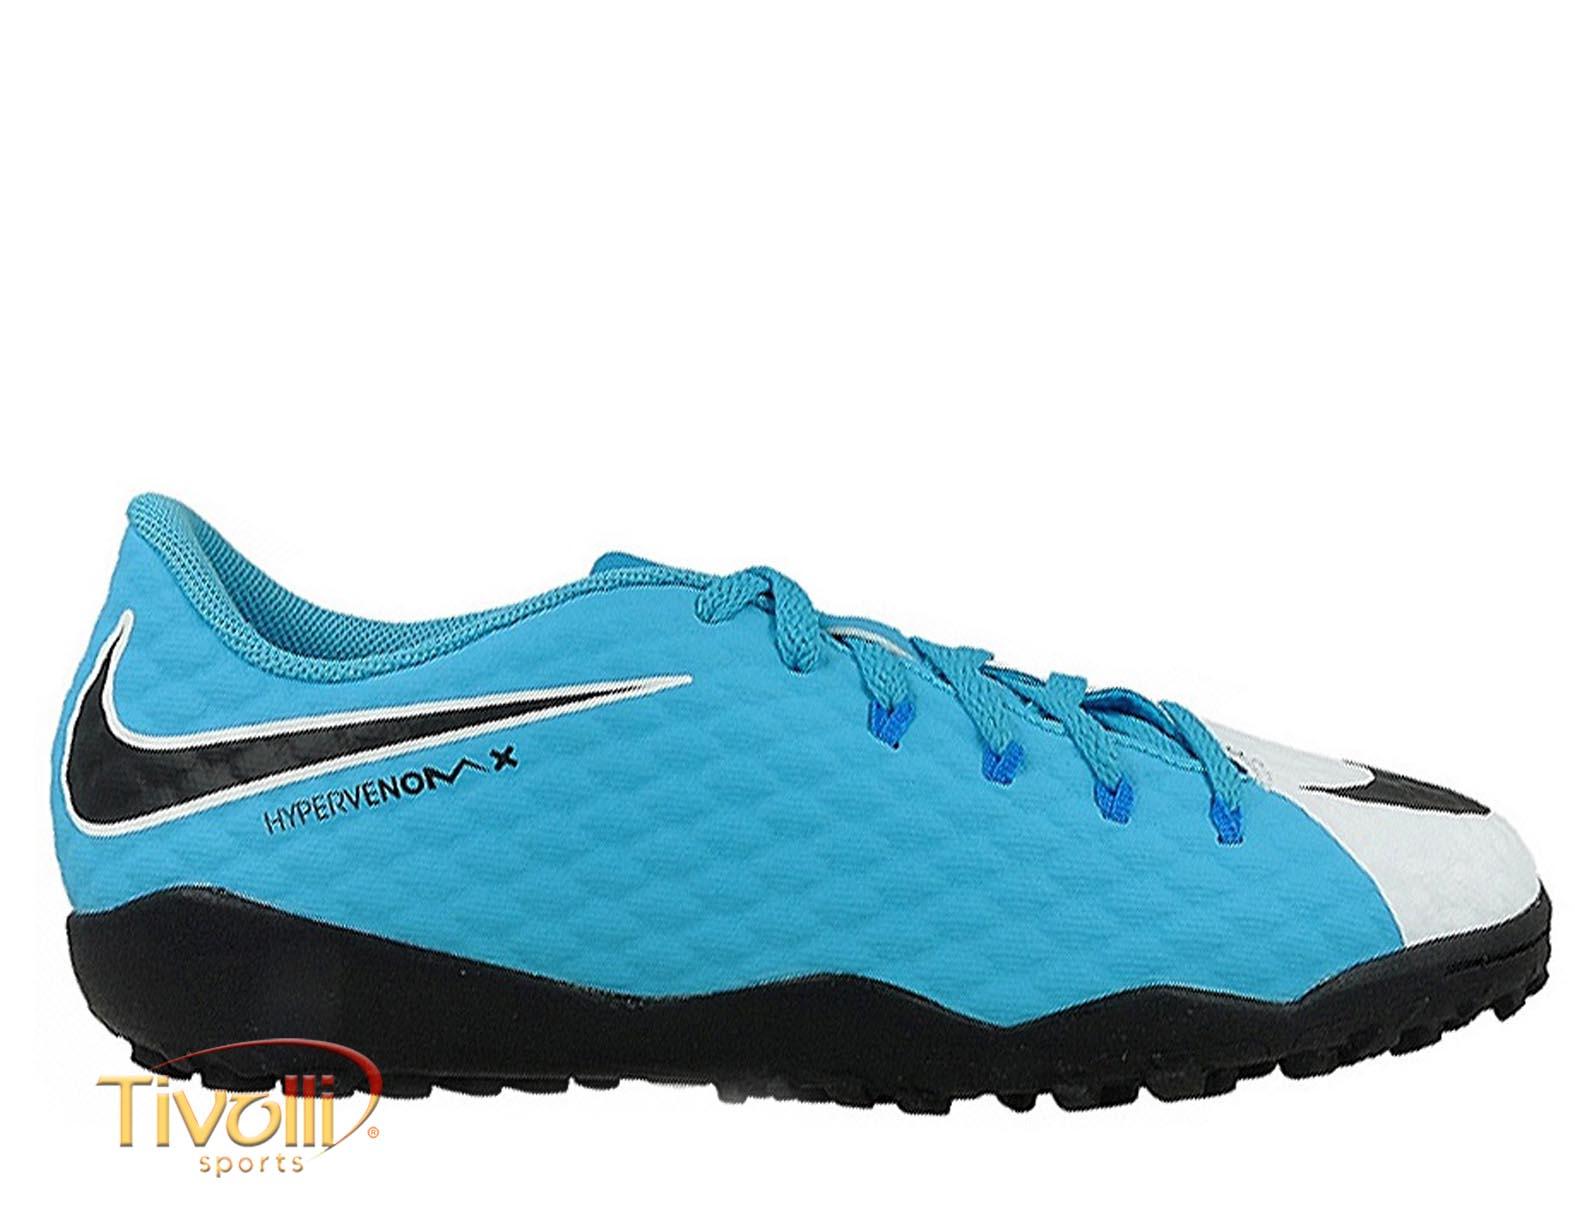 1f6886848b971 Chuteira Nike JR. HypervenomX Phelon III TF Society Infantil